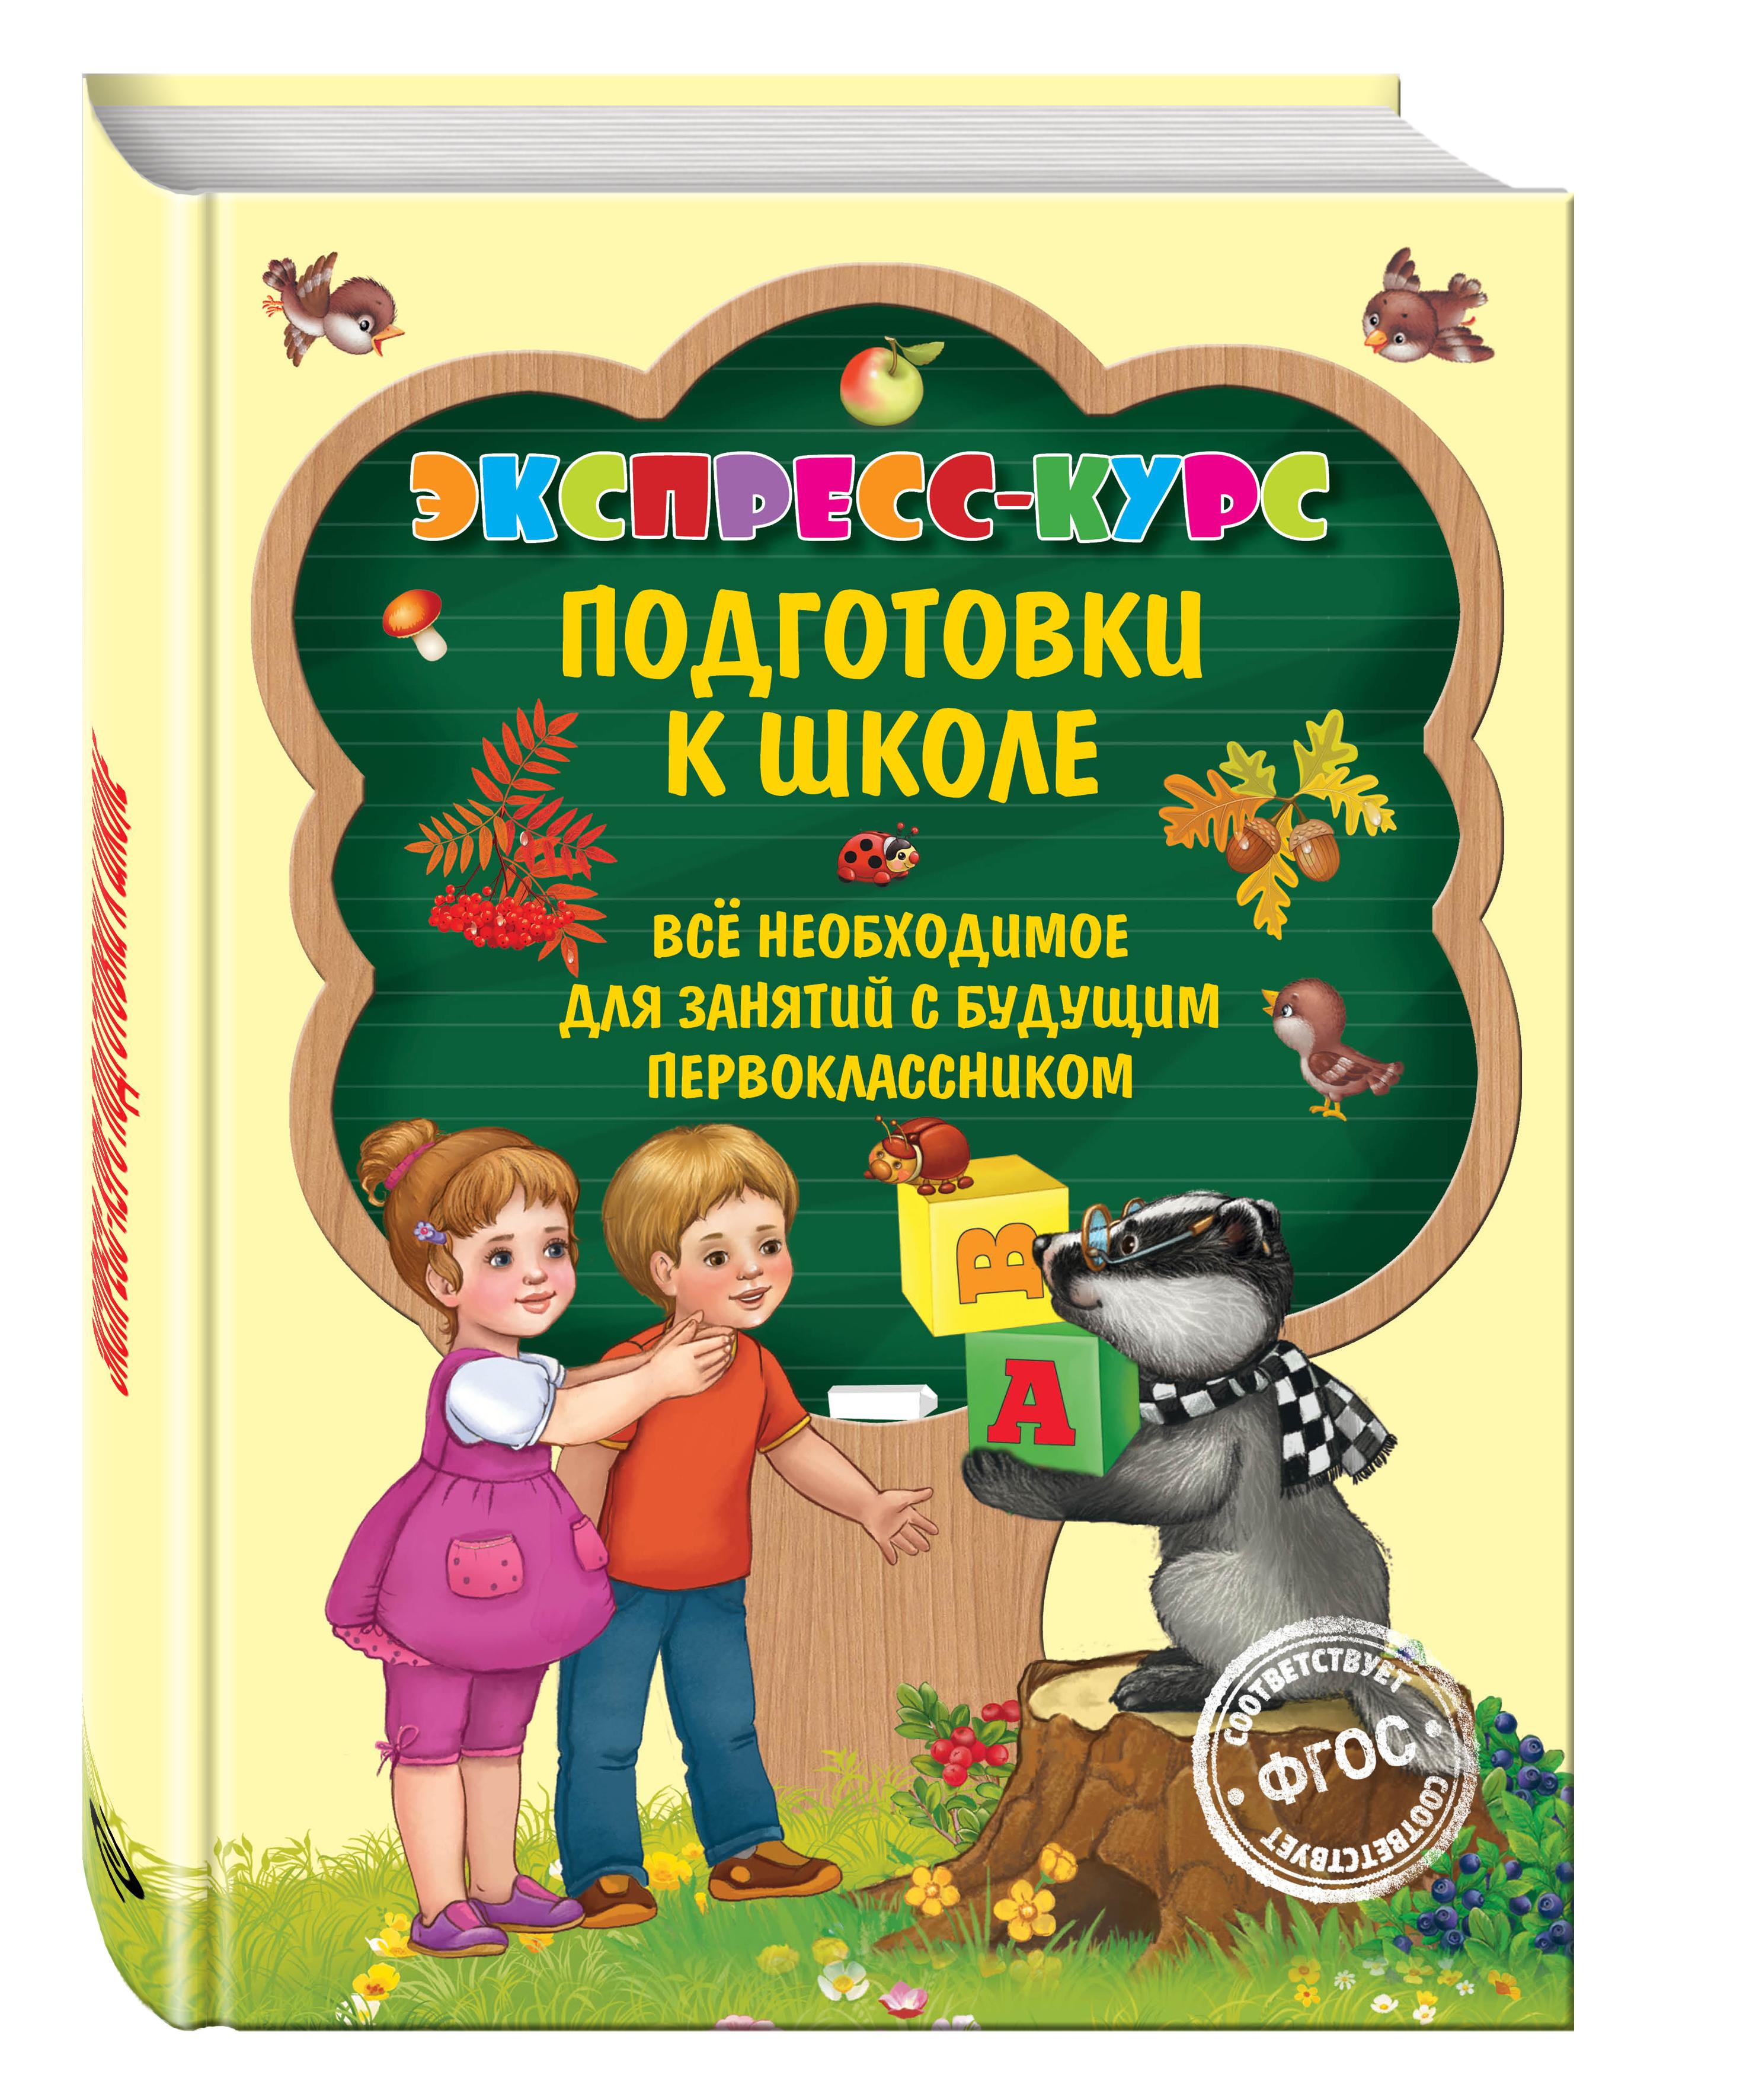 Экспресс-курс подготовки к школе от book24.ru